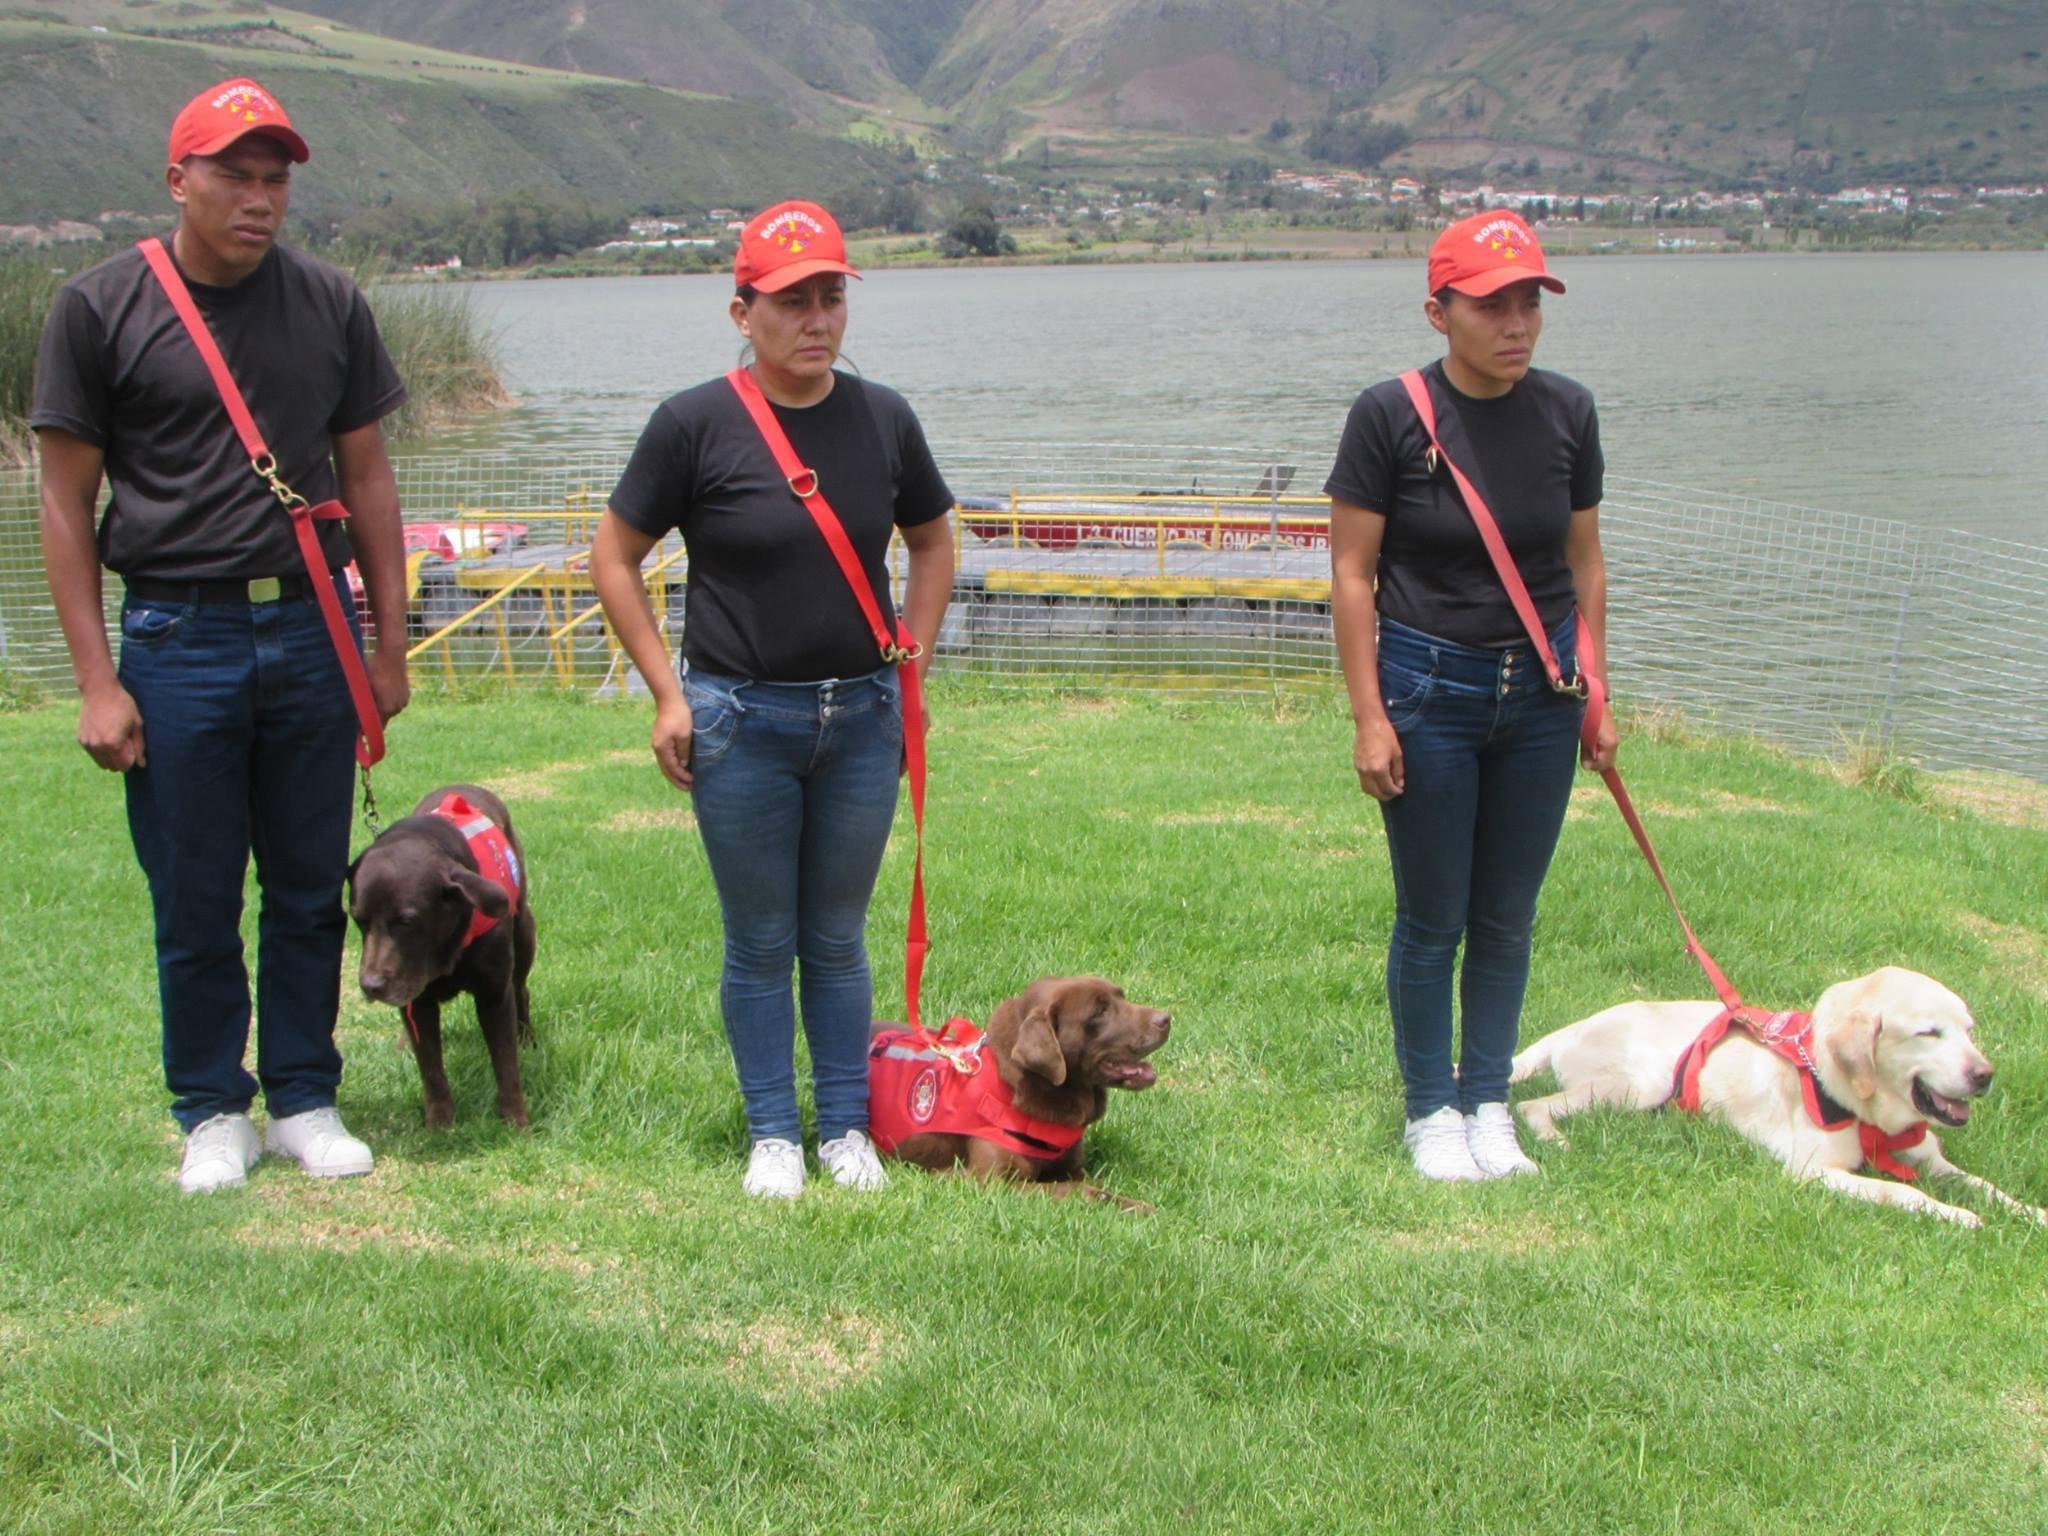 img 5a7e0bd2afca5 - 搜救犬在災區「全力救援」找到生還者後自己卻不幸殉職...